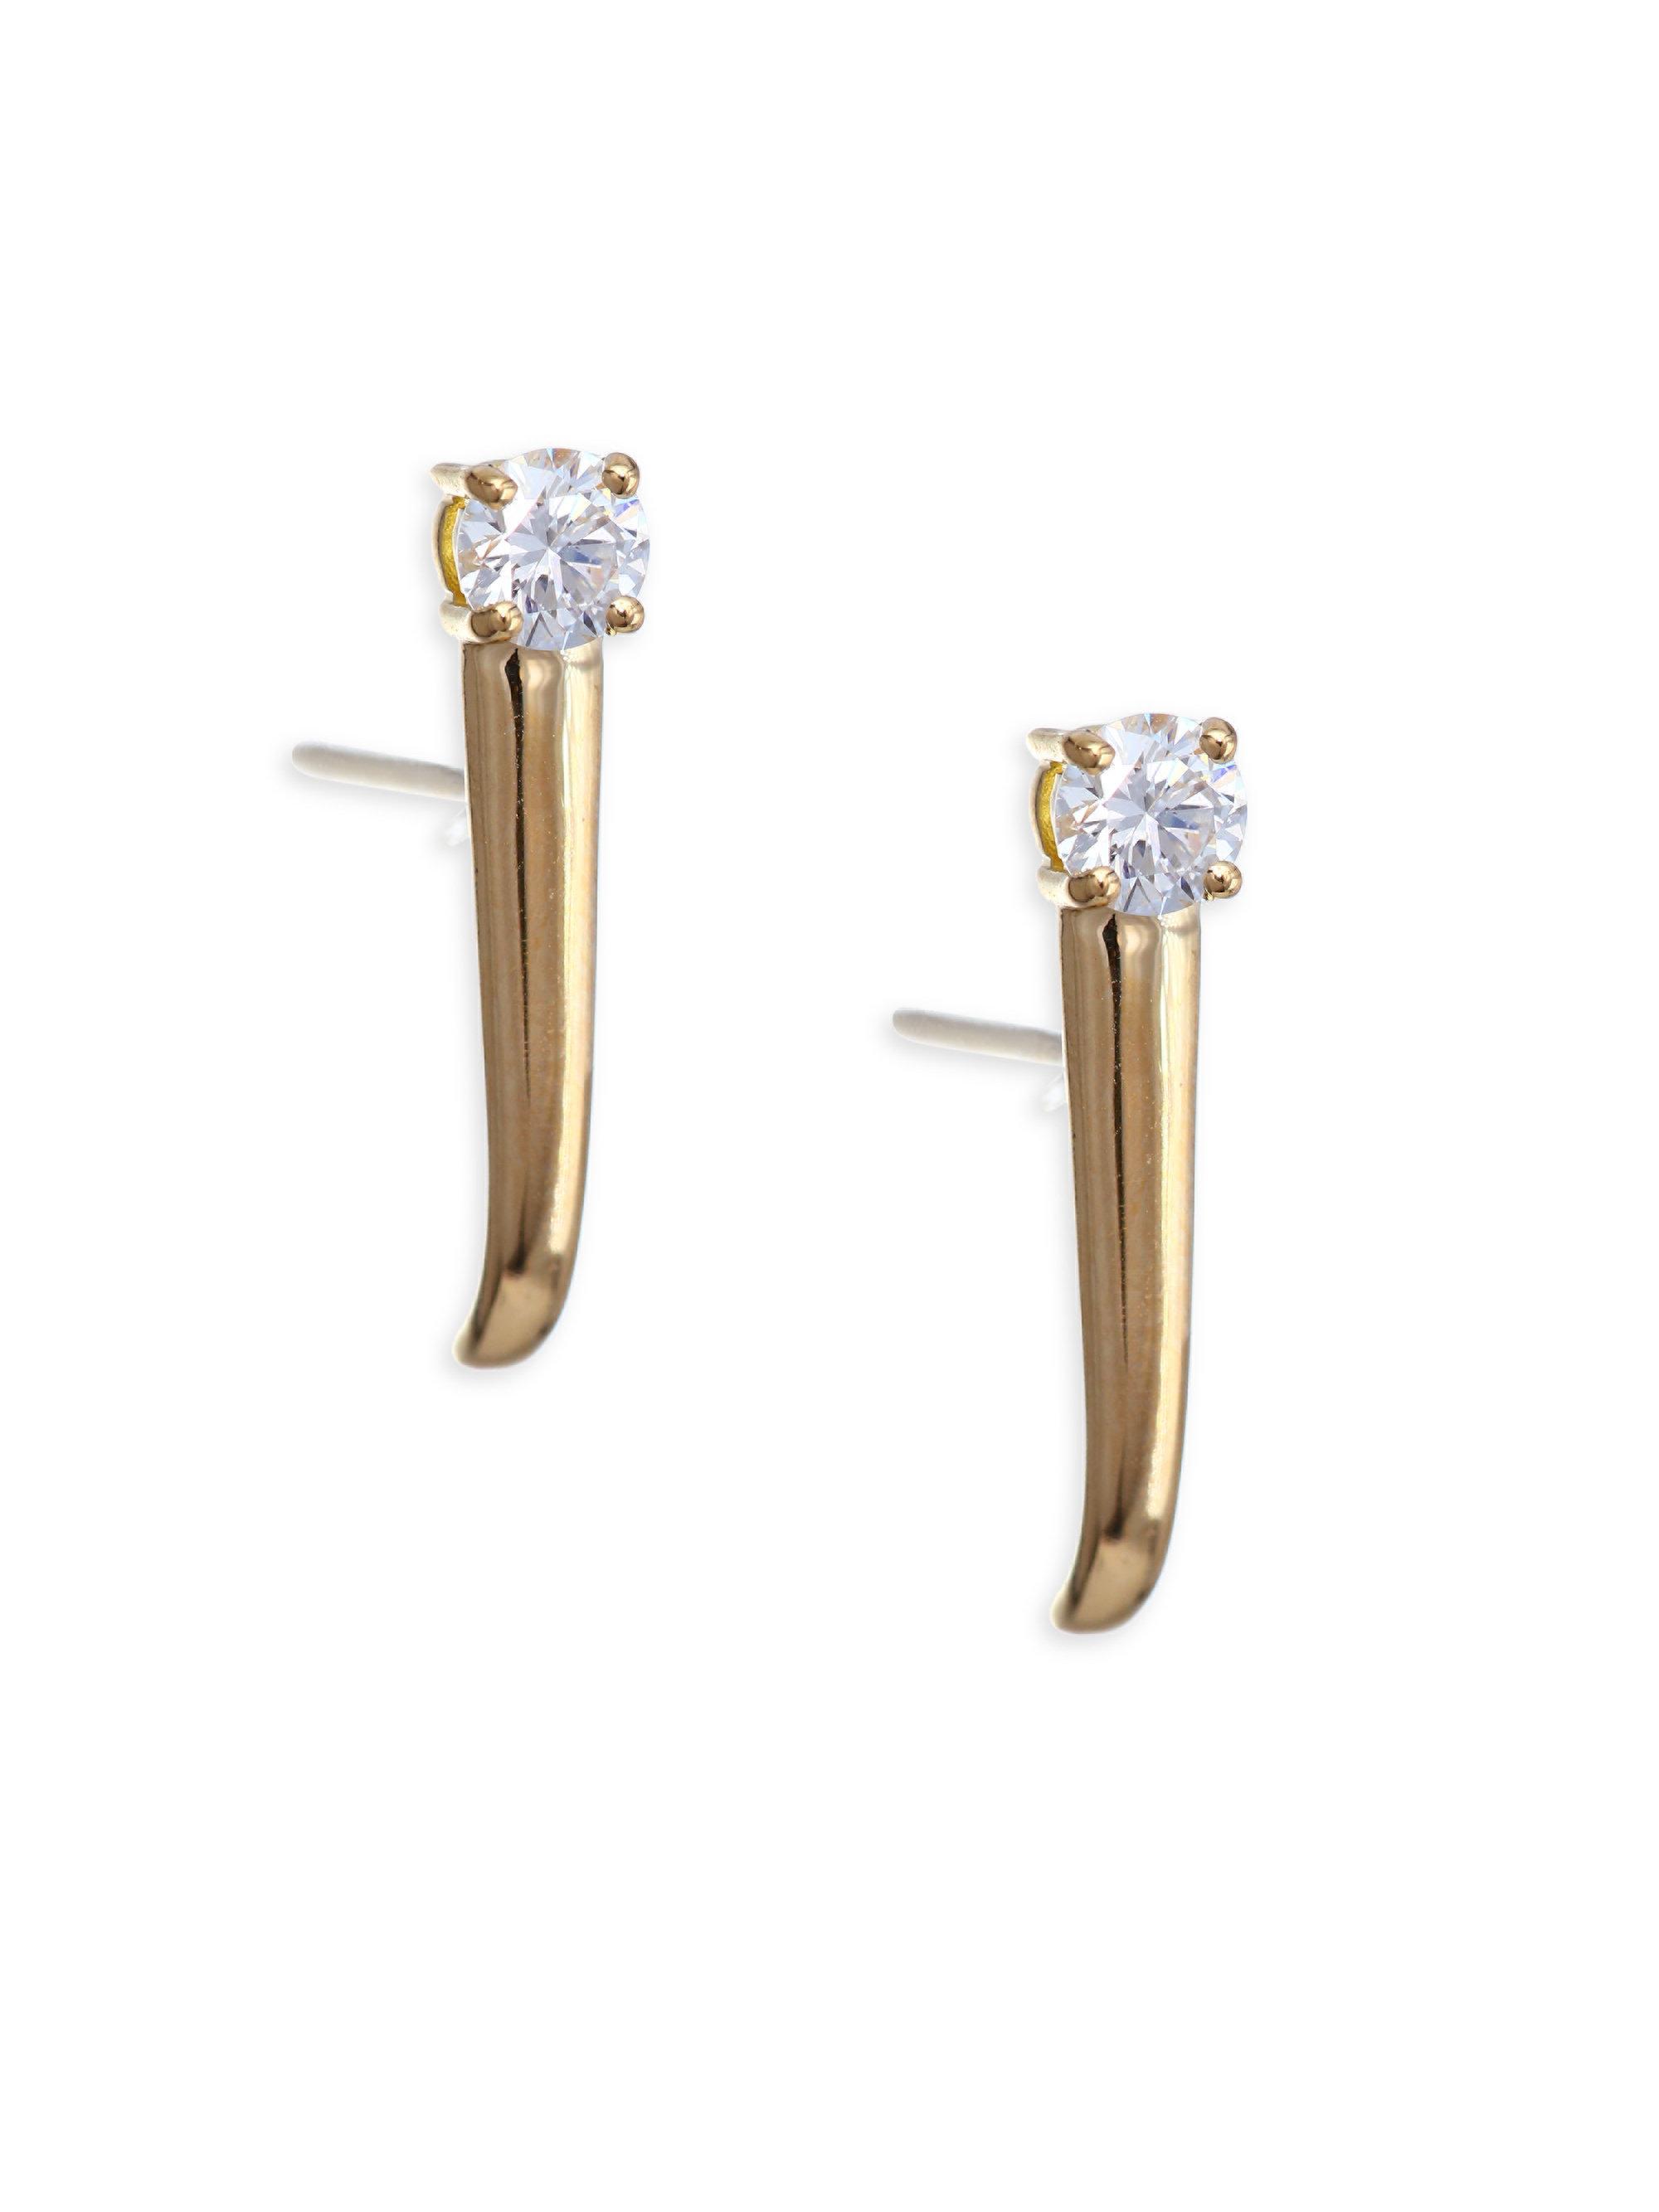 Izzie 18K Gold Diamond Earrings Melissa Kaye mAo9EhM